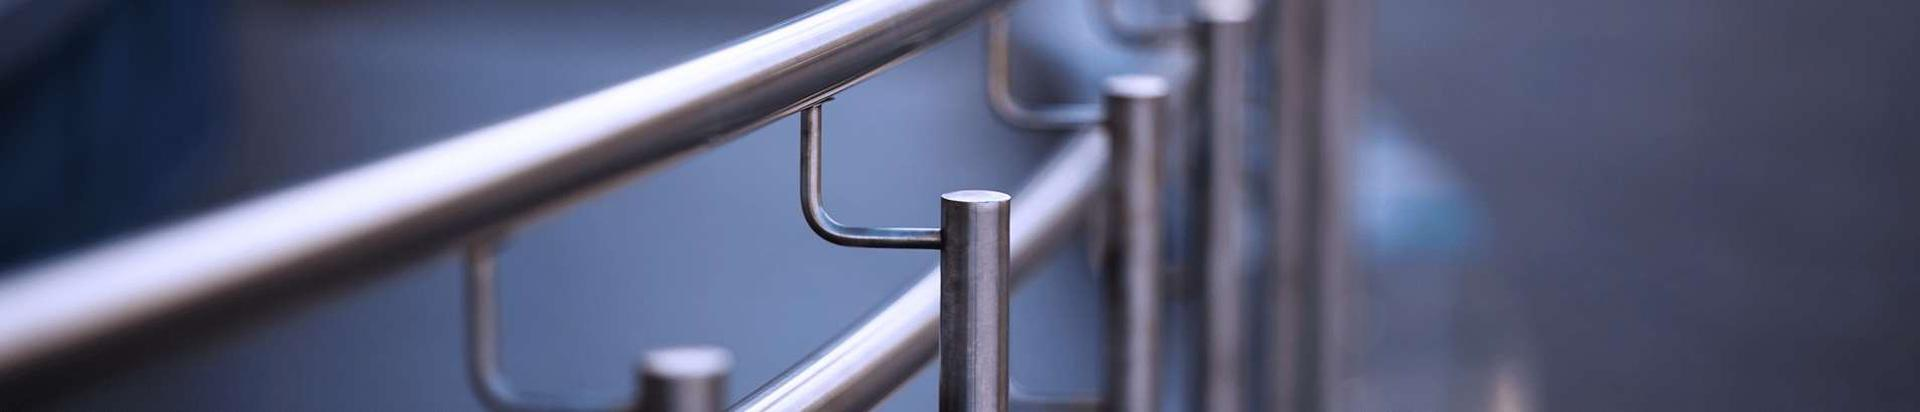 metallitööd, metallitööstus, metallitöötlus